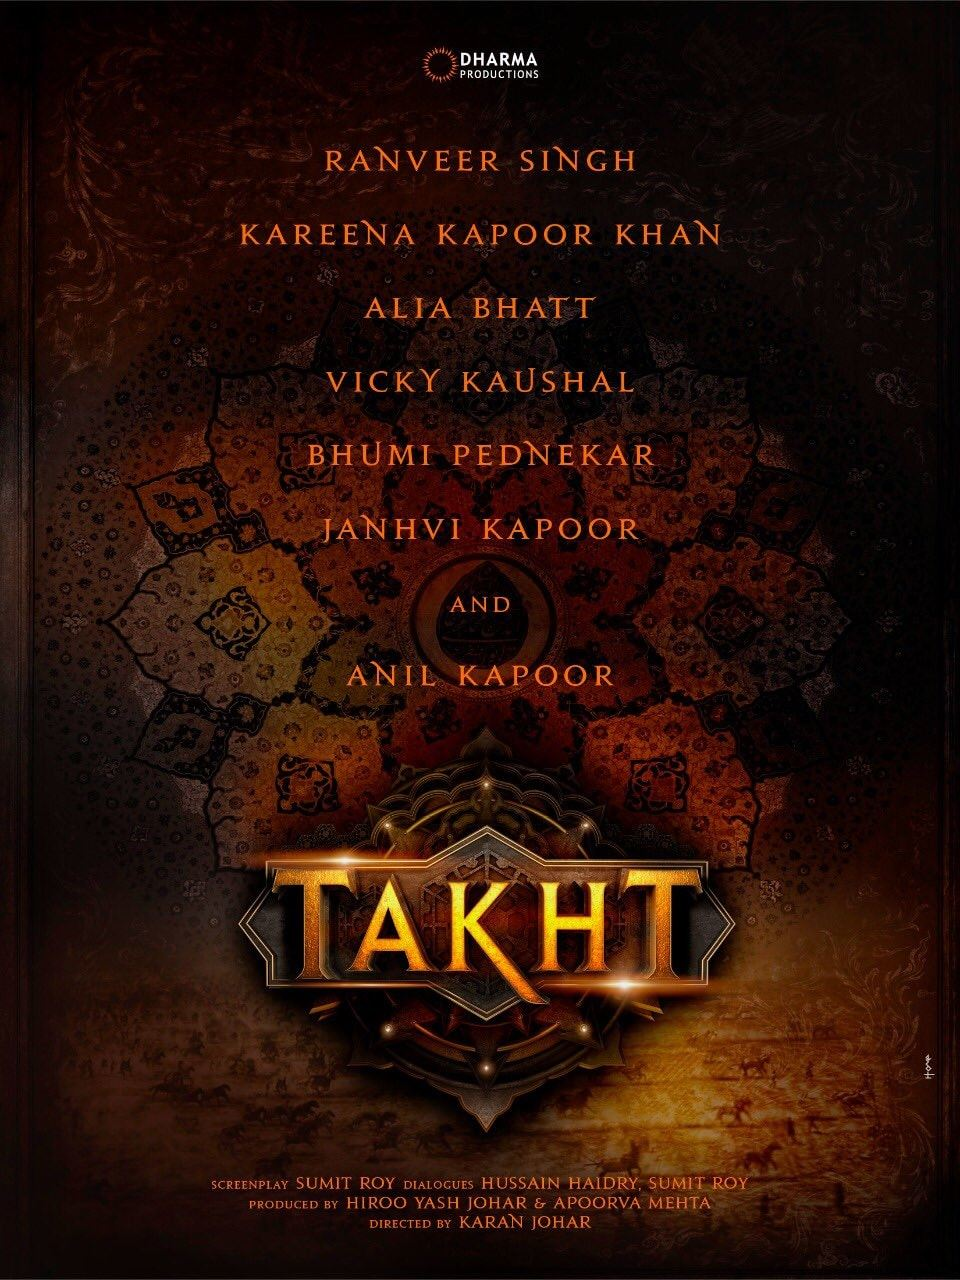 Karan Johar's Takht (2020) | Ranbir Kapoor | Alia Bhatt | Kareena Kapoor